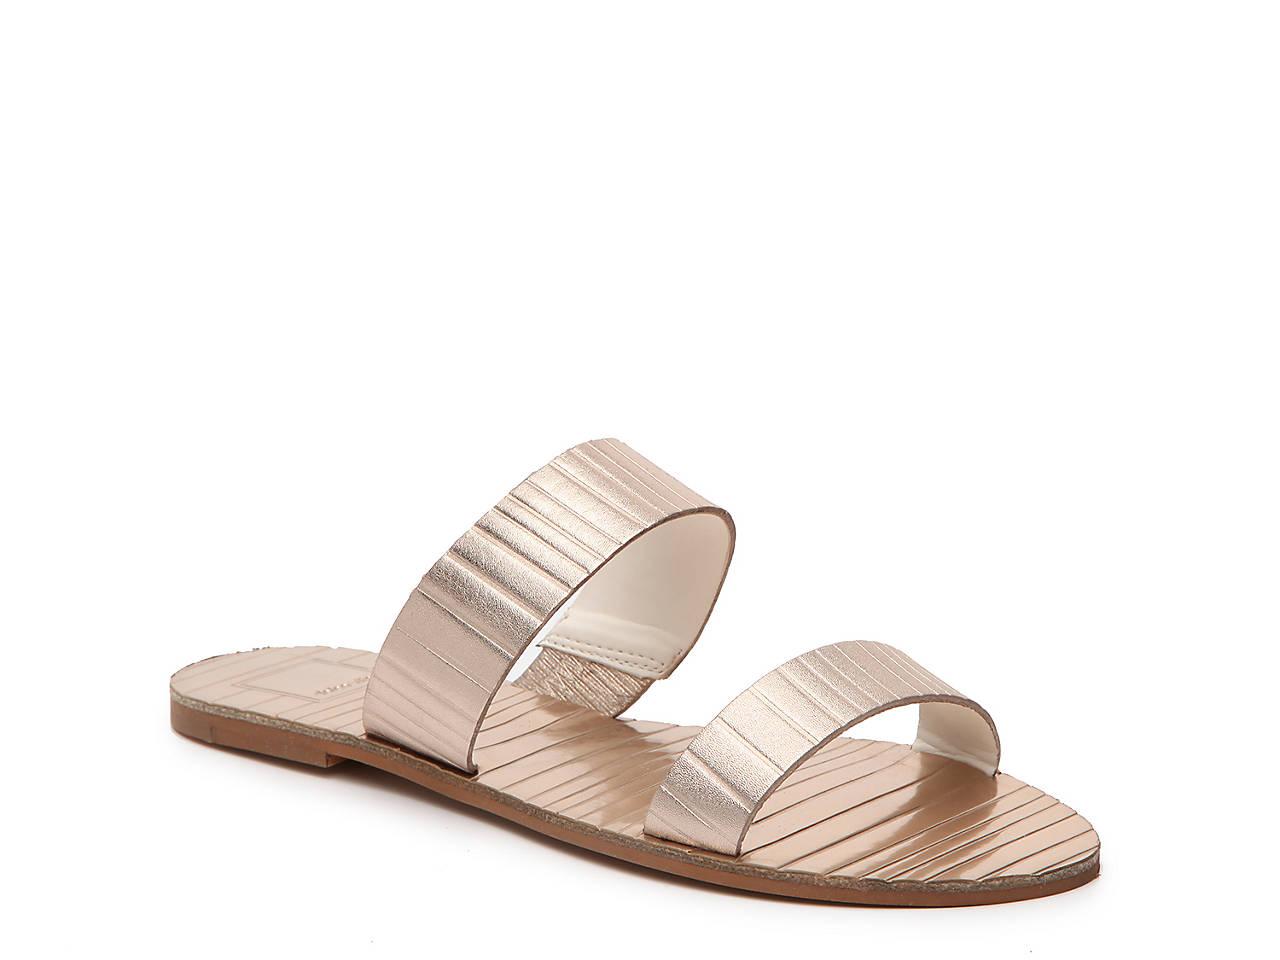 c1591fd93 Dolce Vita Jaz Flat Sandal Women's Shoes | DSW